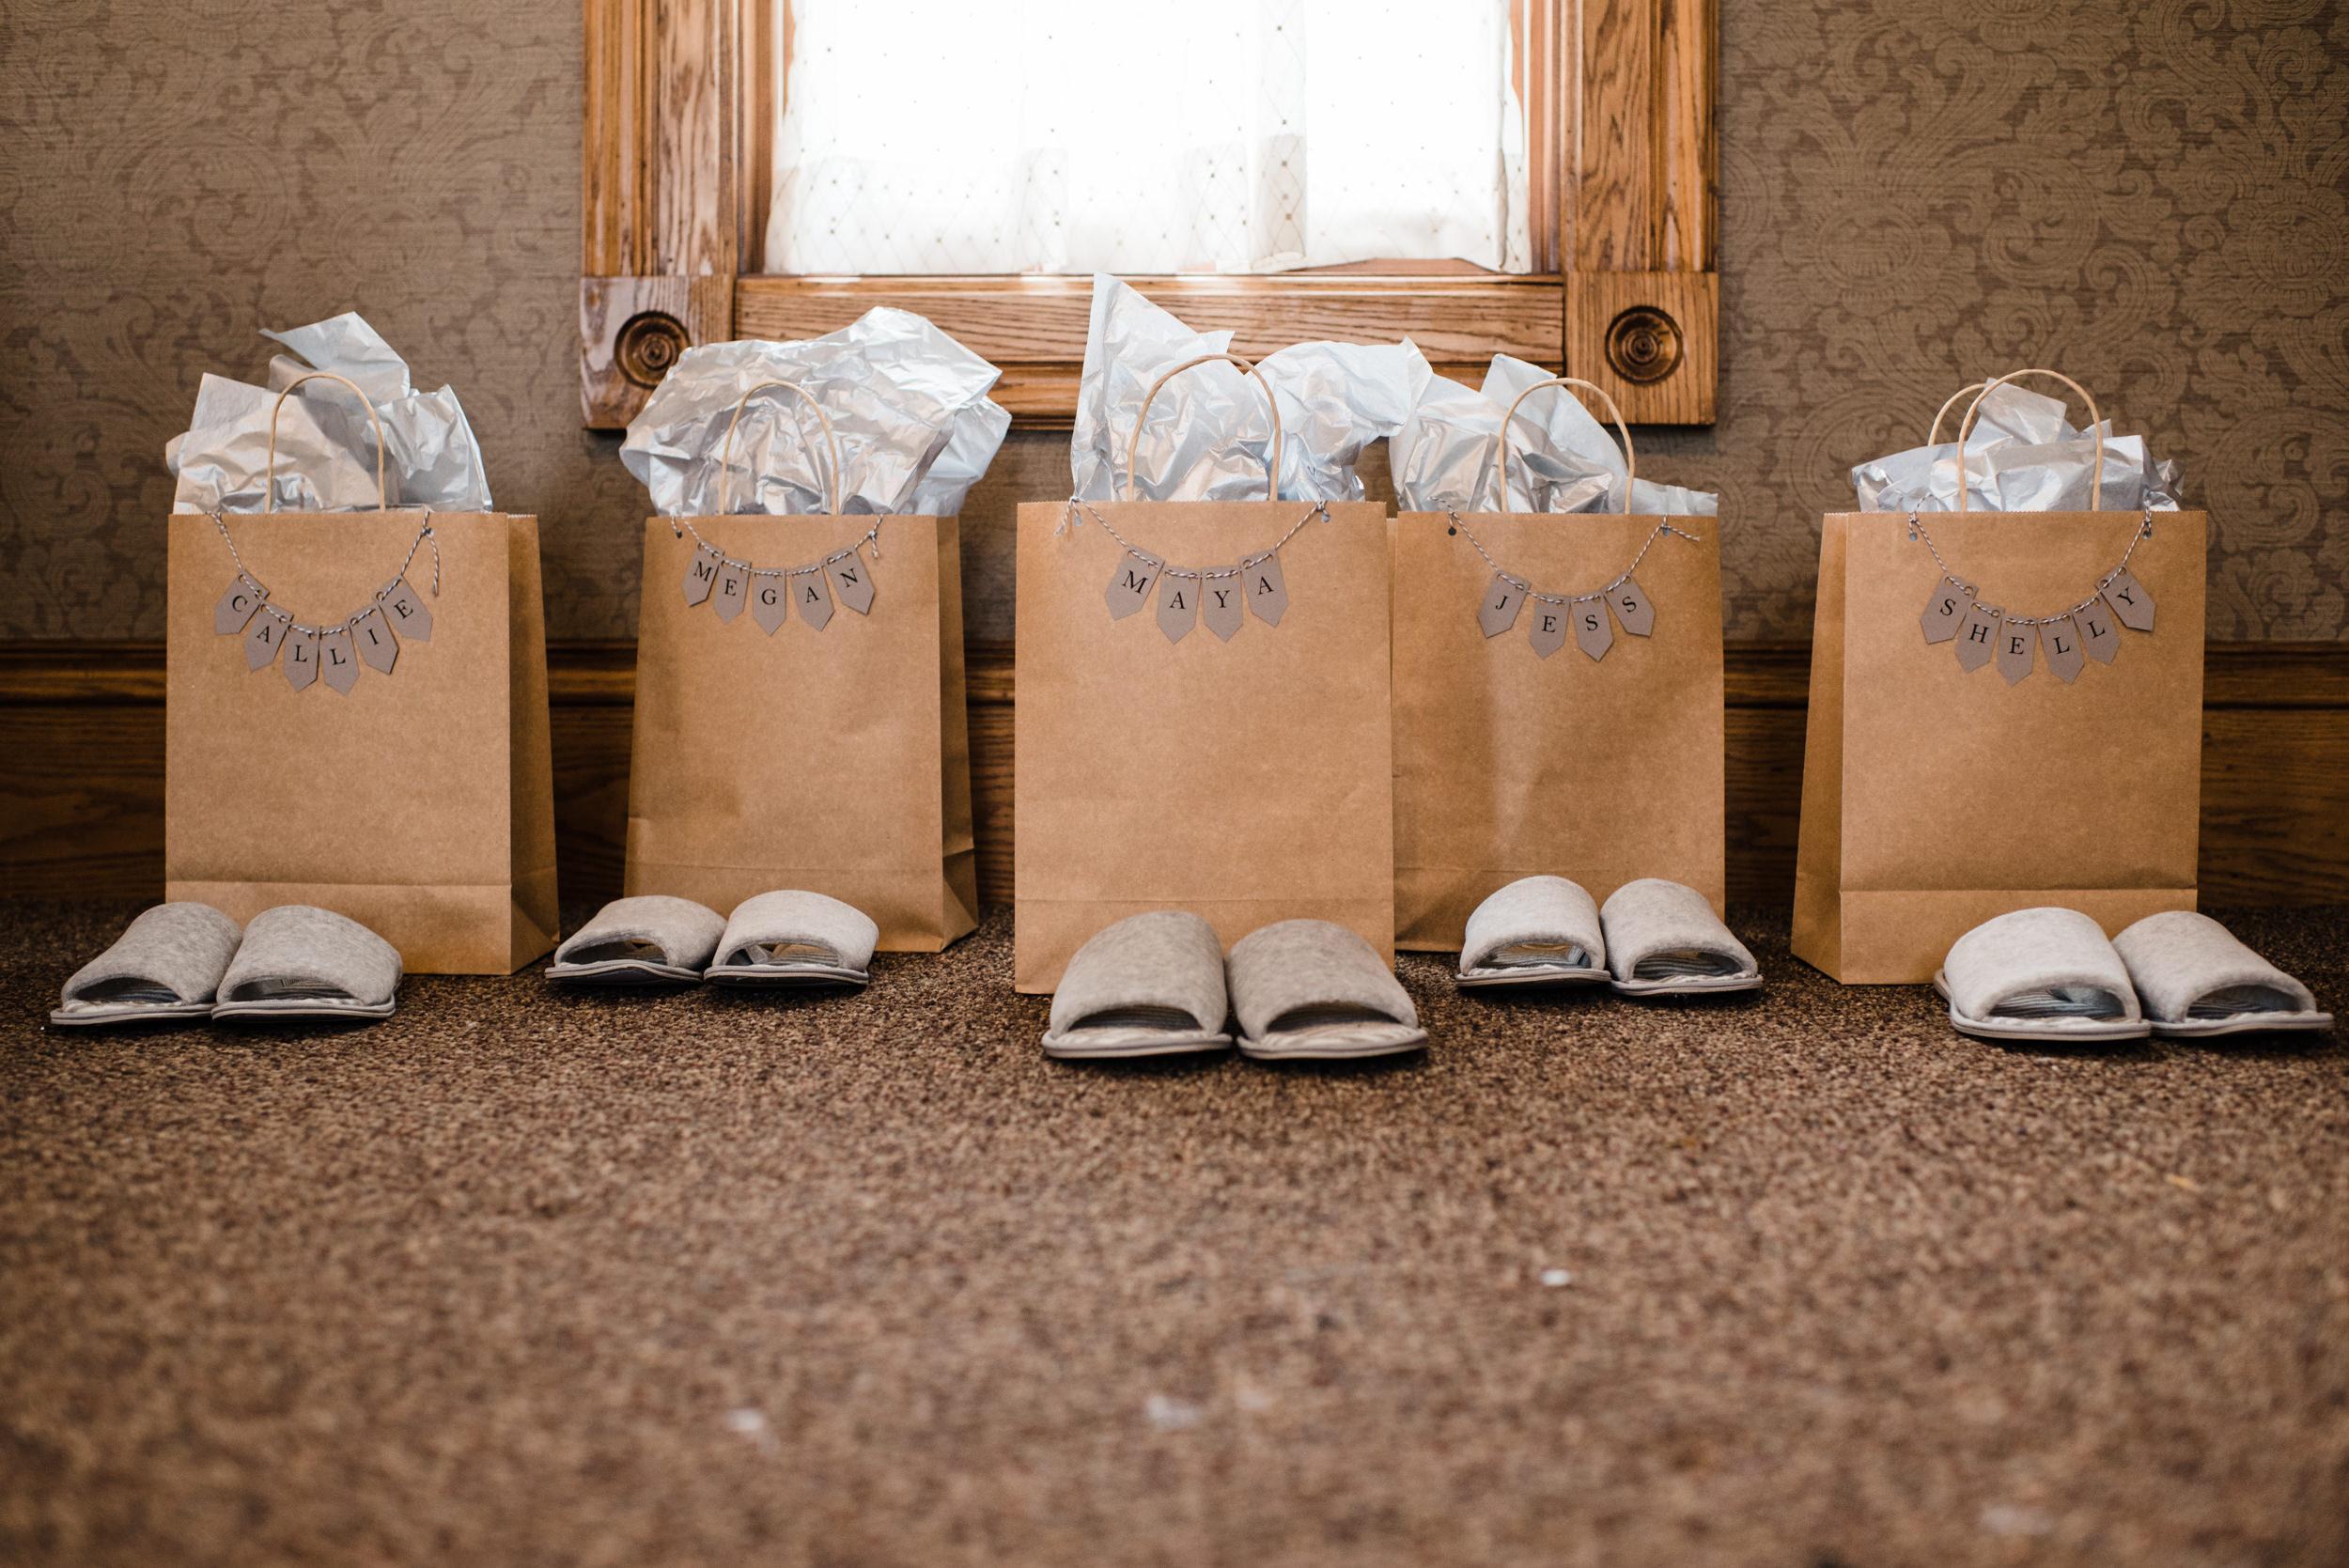 Colorado mountain wedding photographer at Brookeside Gardens details of wedding gifts